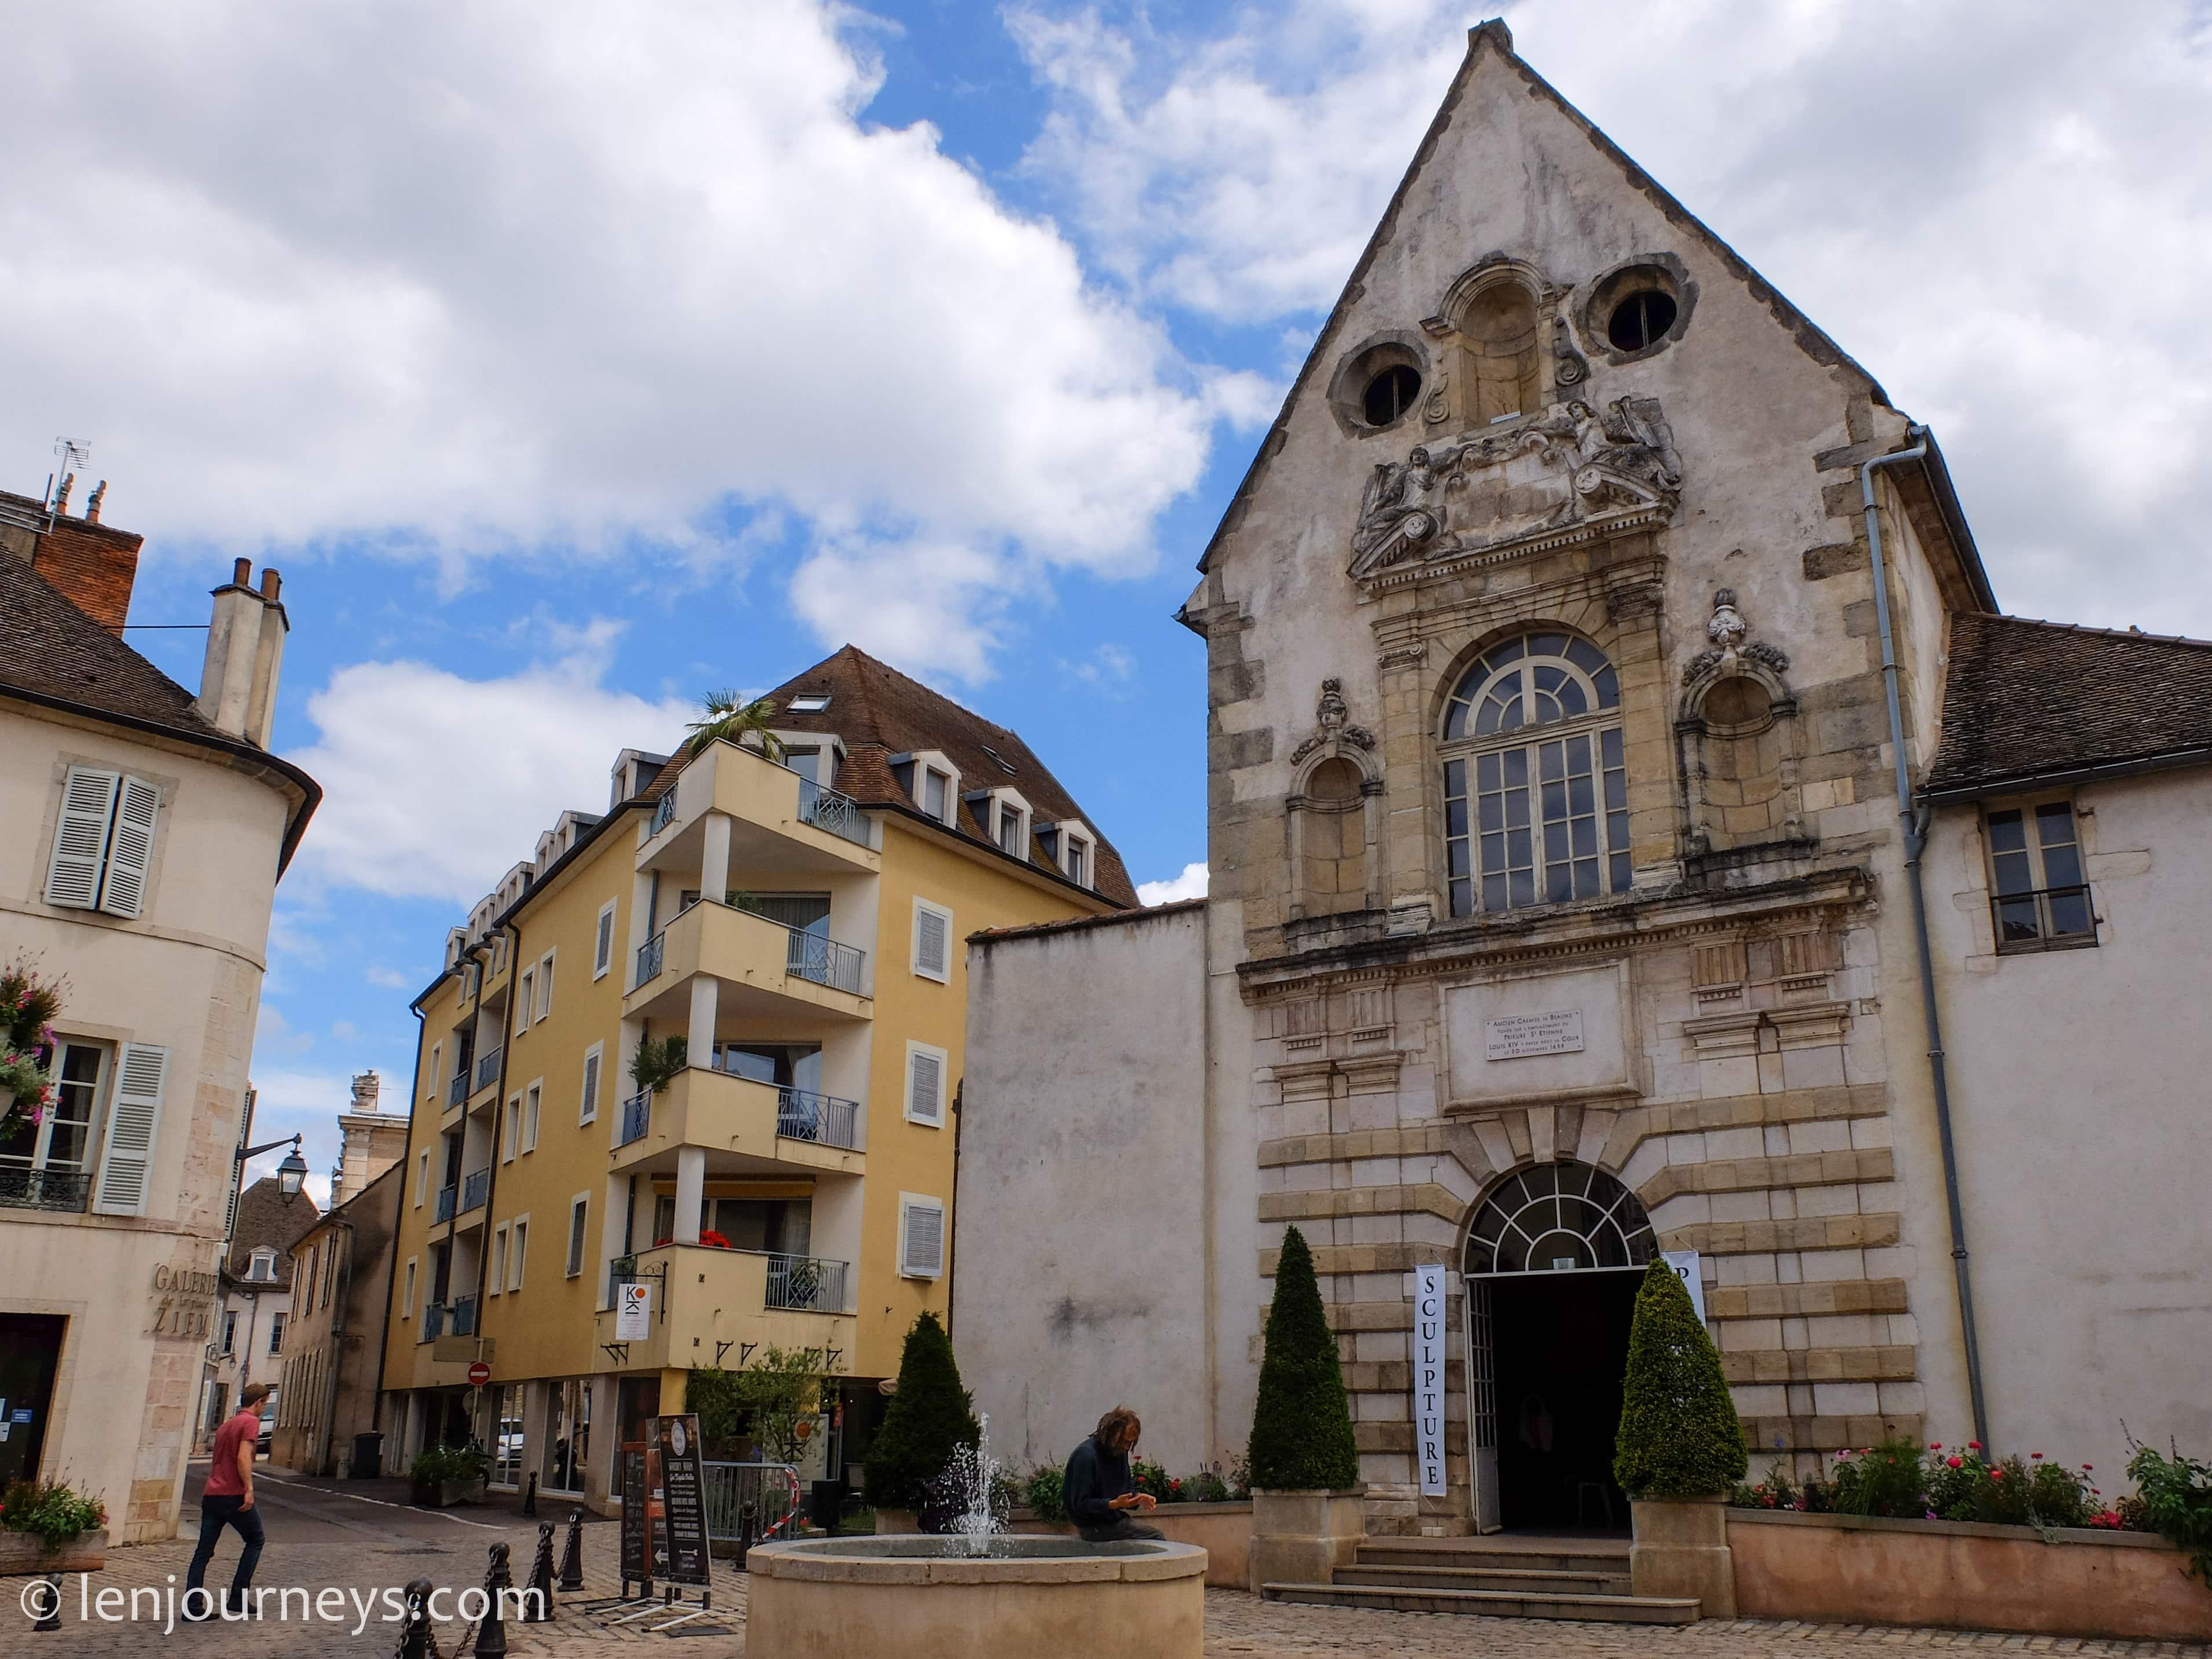 Beautiful building in Beaune, Burgundy